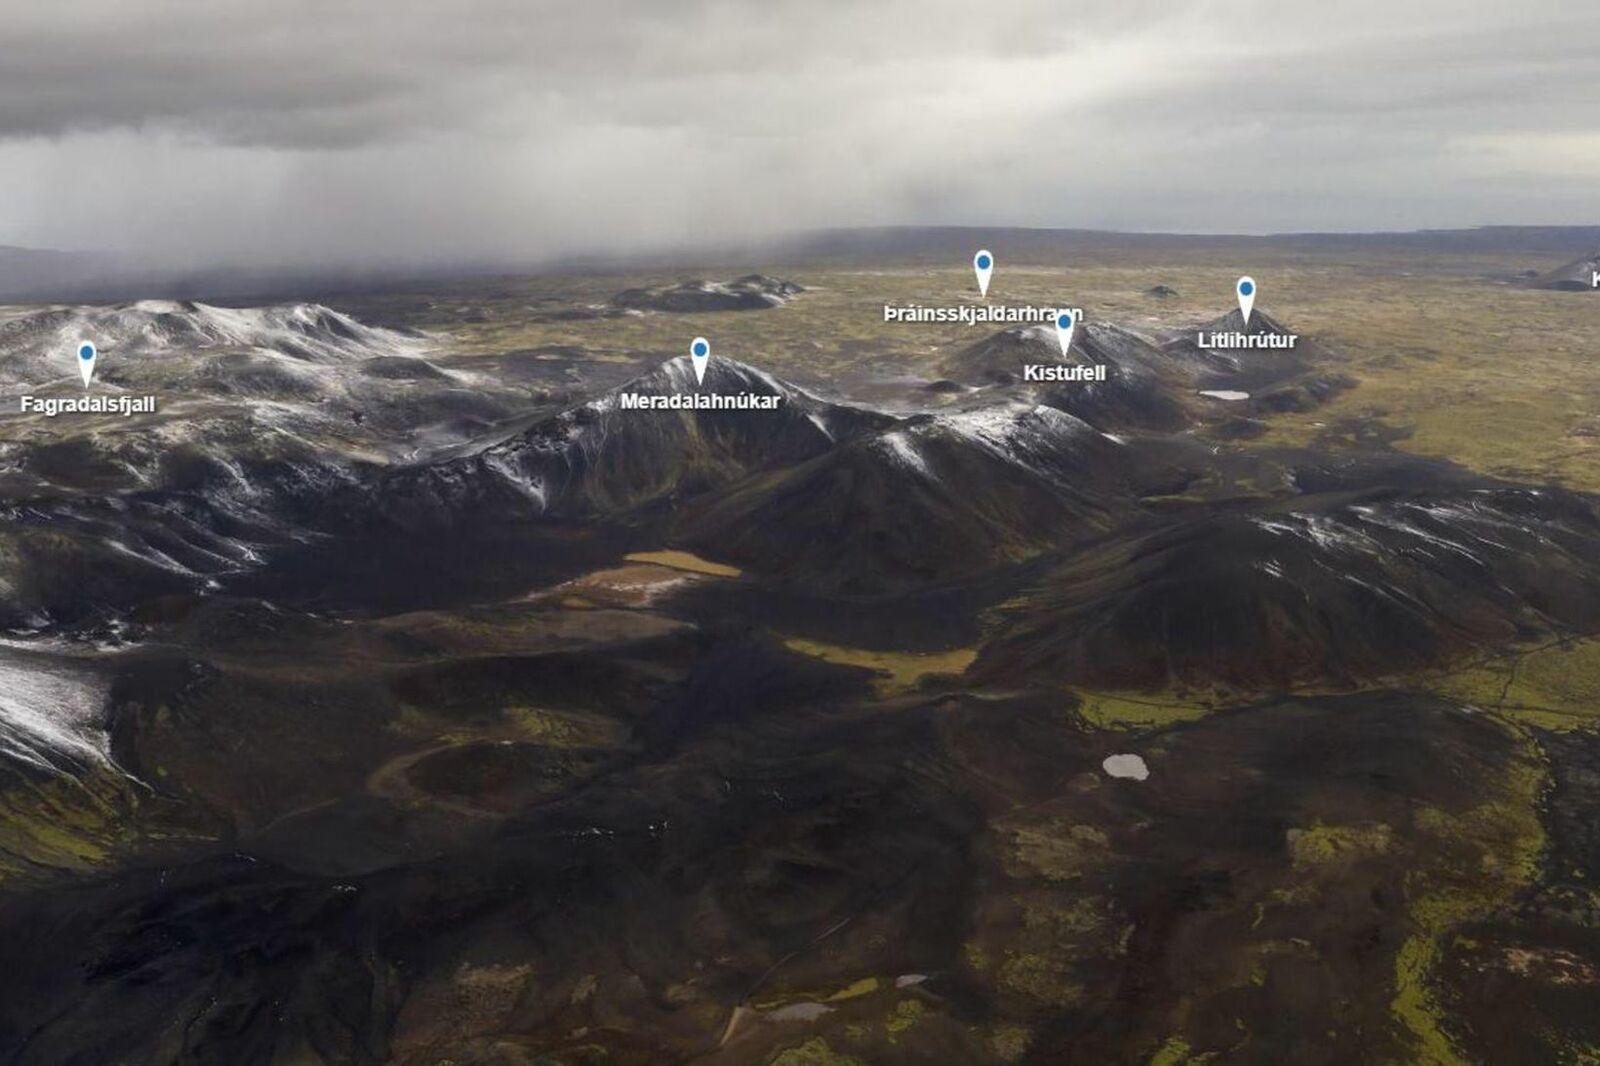 Péninsule de Reykjanes - environs de  Fagradalsfjall  - Doc.  Skjáskot  Iceland 360 VR  via mbls